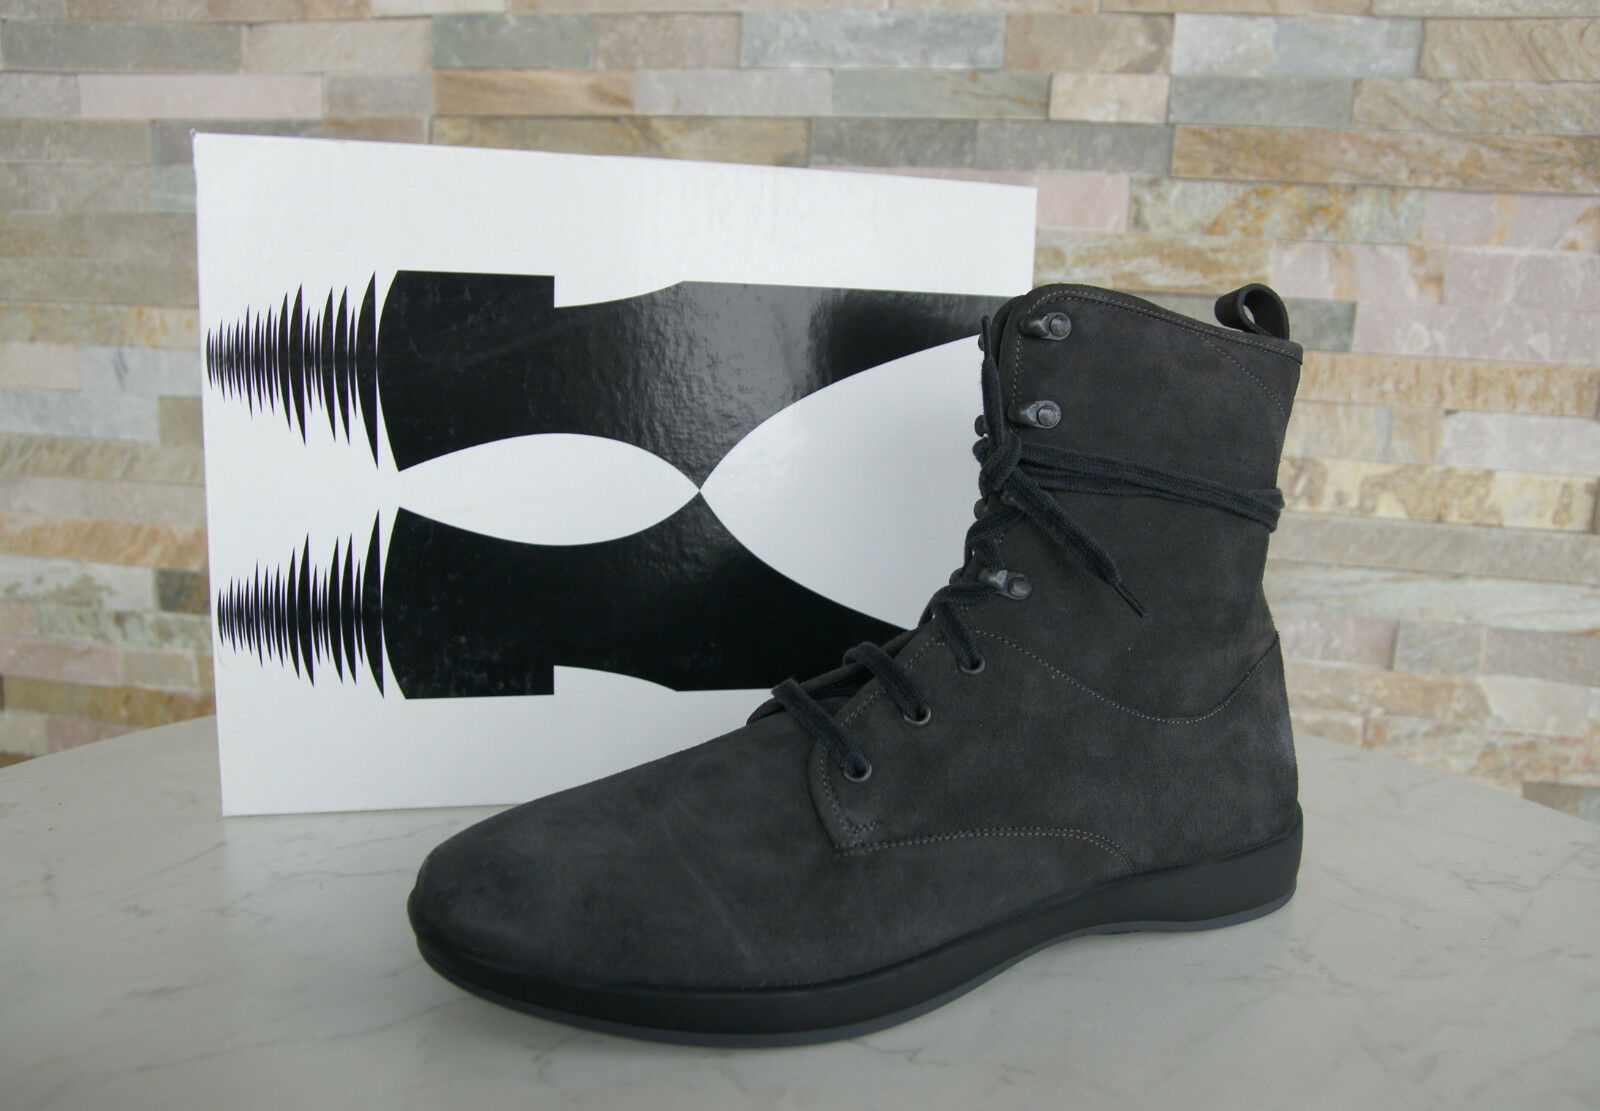 MORESCHI Gr Vintage 41,5 7,5 Stiefeletten Booties Vintage Gr Schuhe dunkelgrau NEU c2ca68